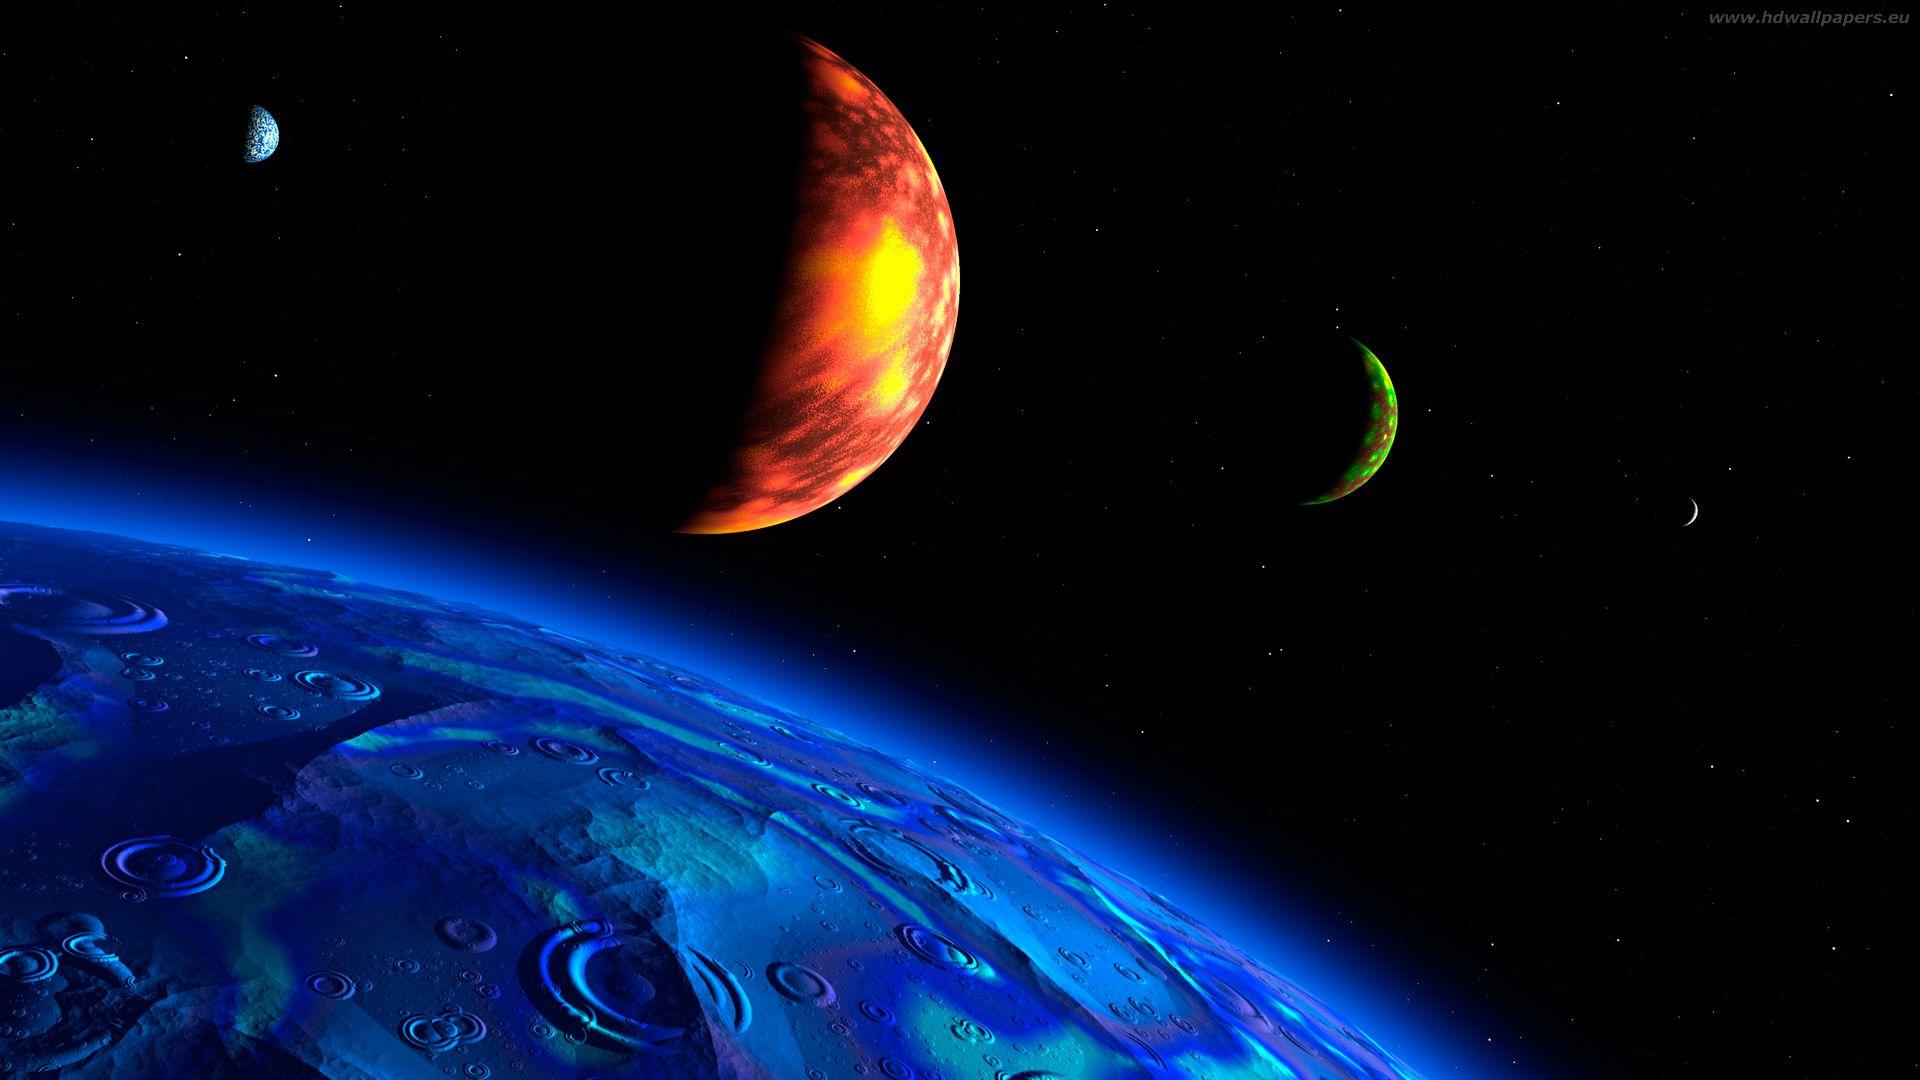 Outer Space Background Hd Wallpaper Desktop Wallpaper Fall Hd Nature Wallpapers